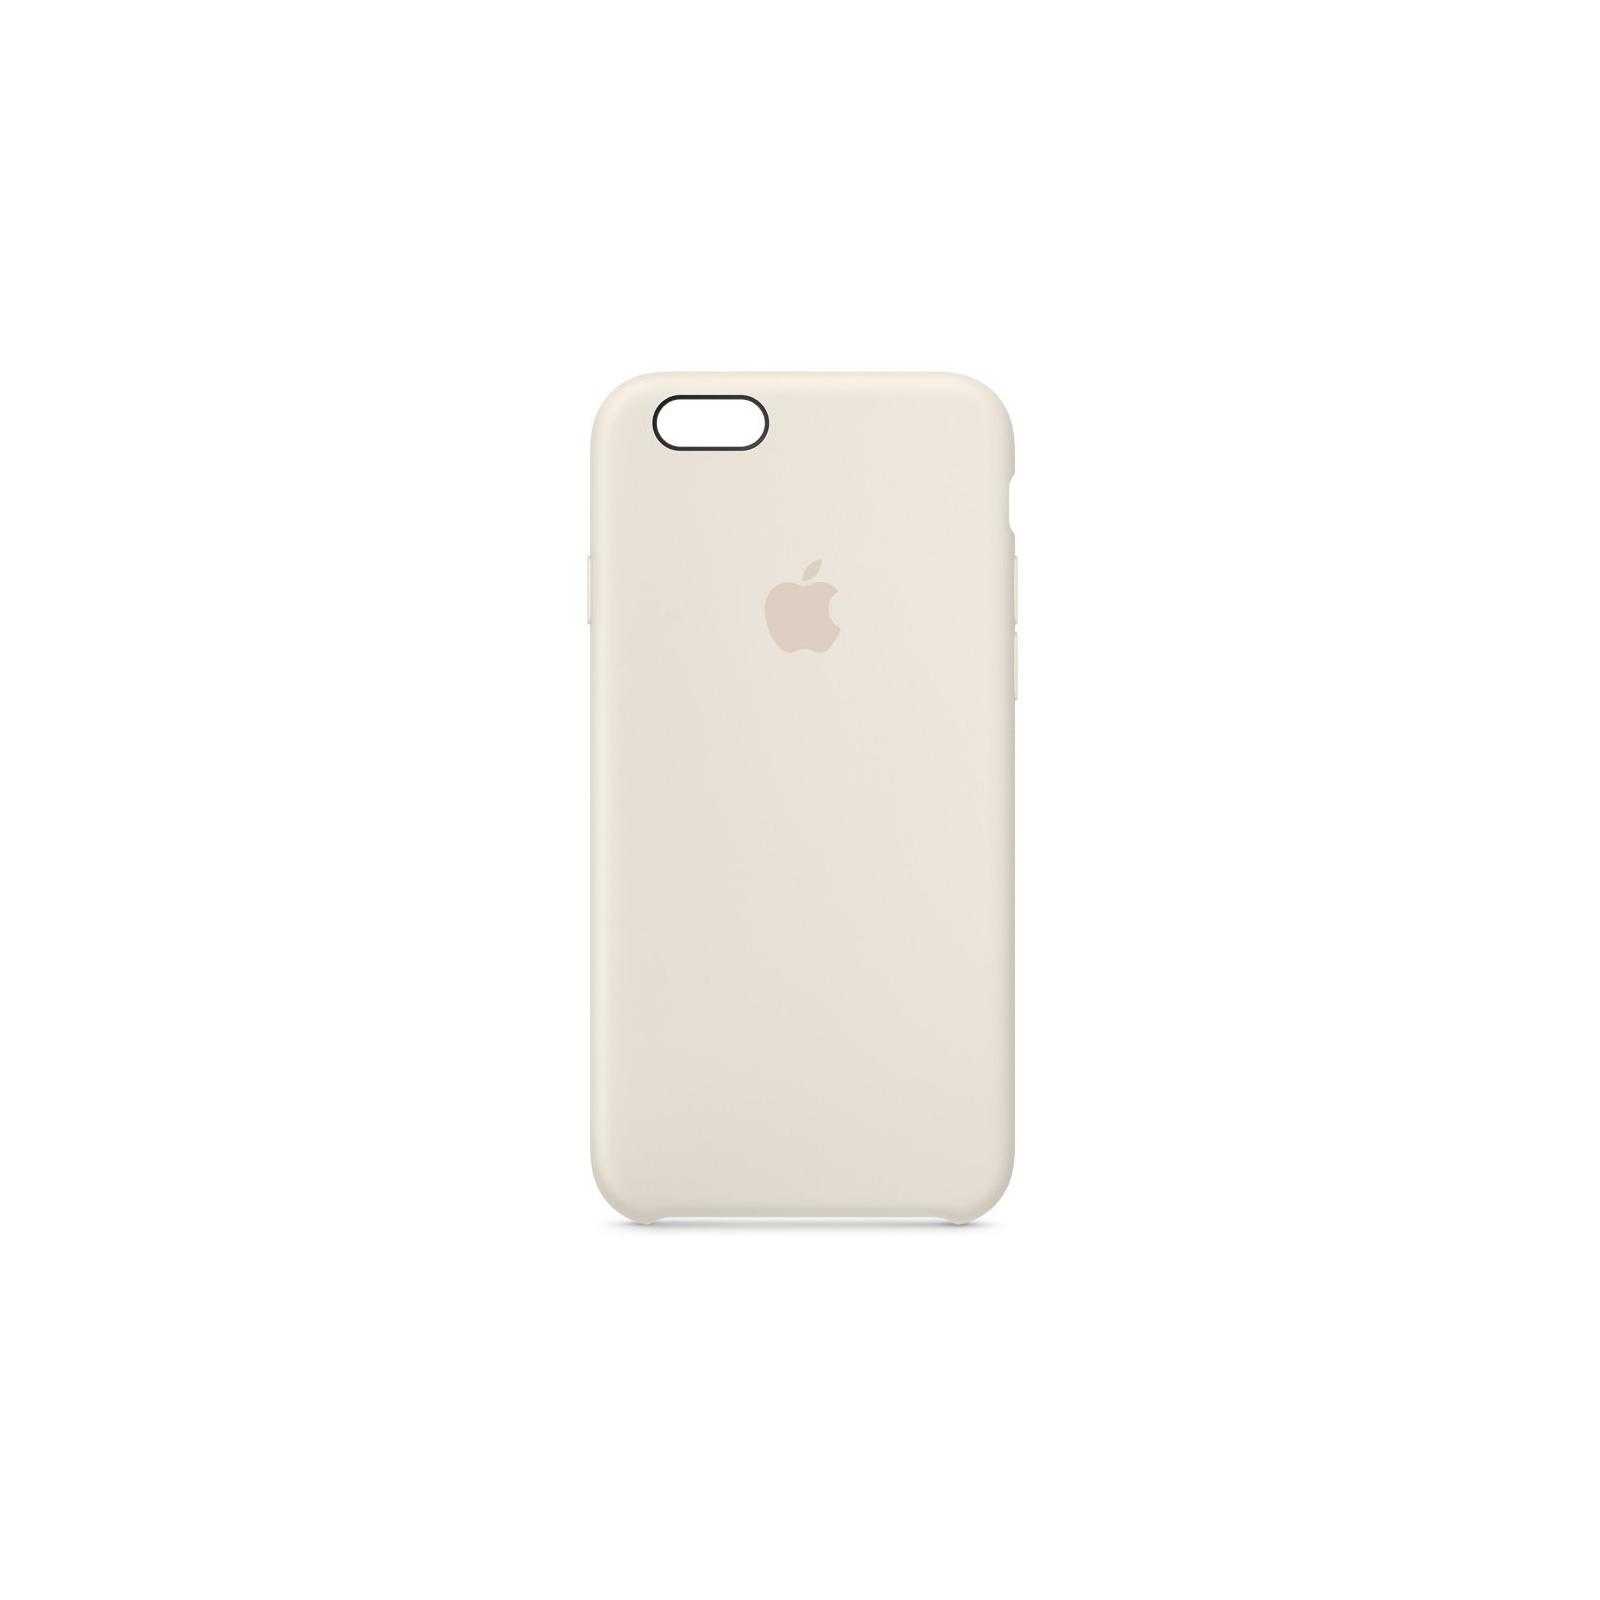 Чехол для моб. телефона Apple для iPhone 6/6s Antique White (MLCX2ZM/A)